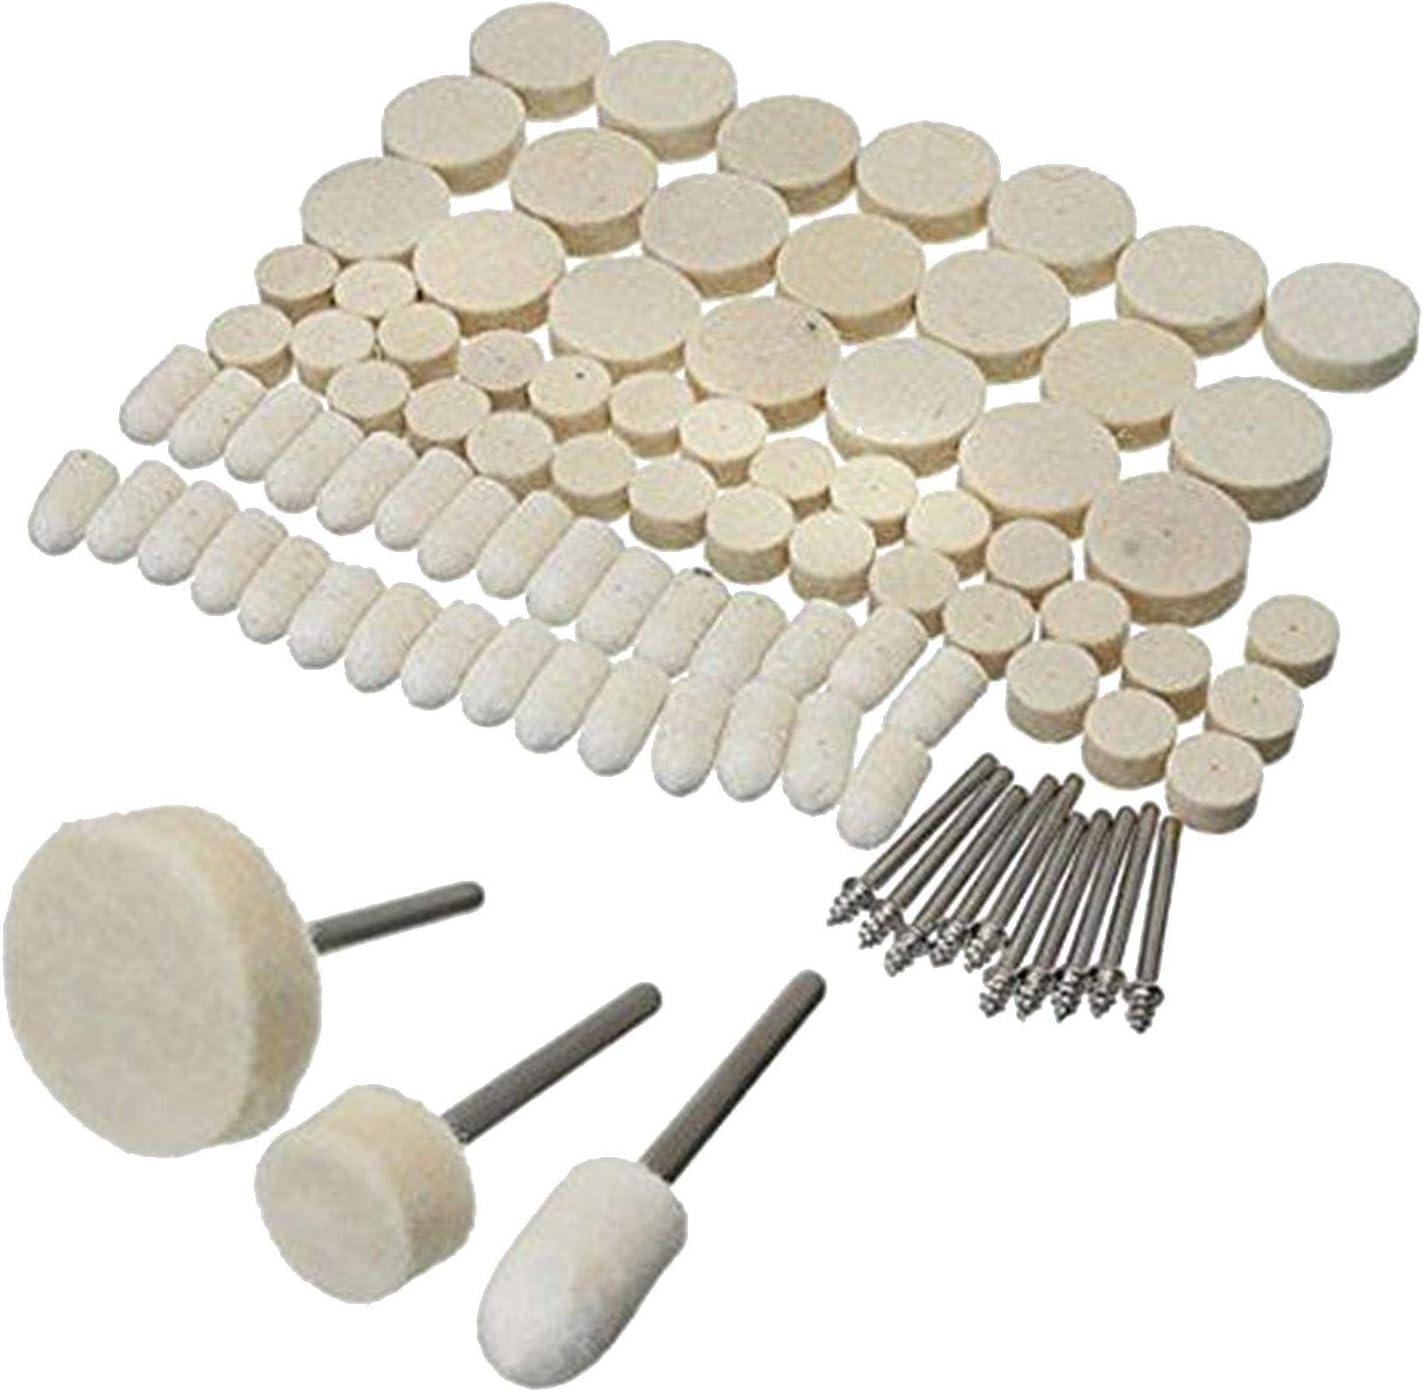 20Pcs Felt Polishing Buffing Pads Wheel Wool Plastic Dremel Rotary Tool Set US